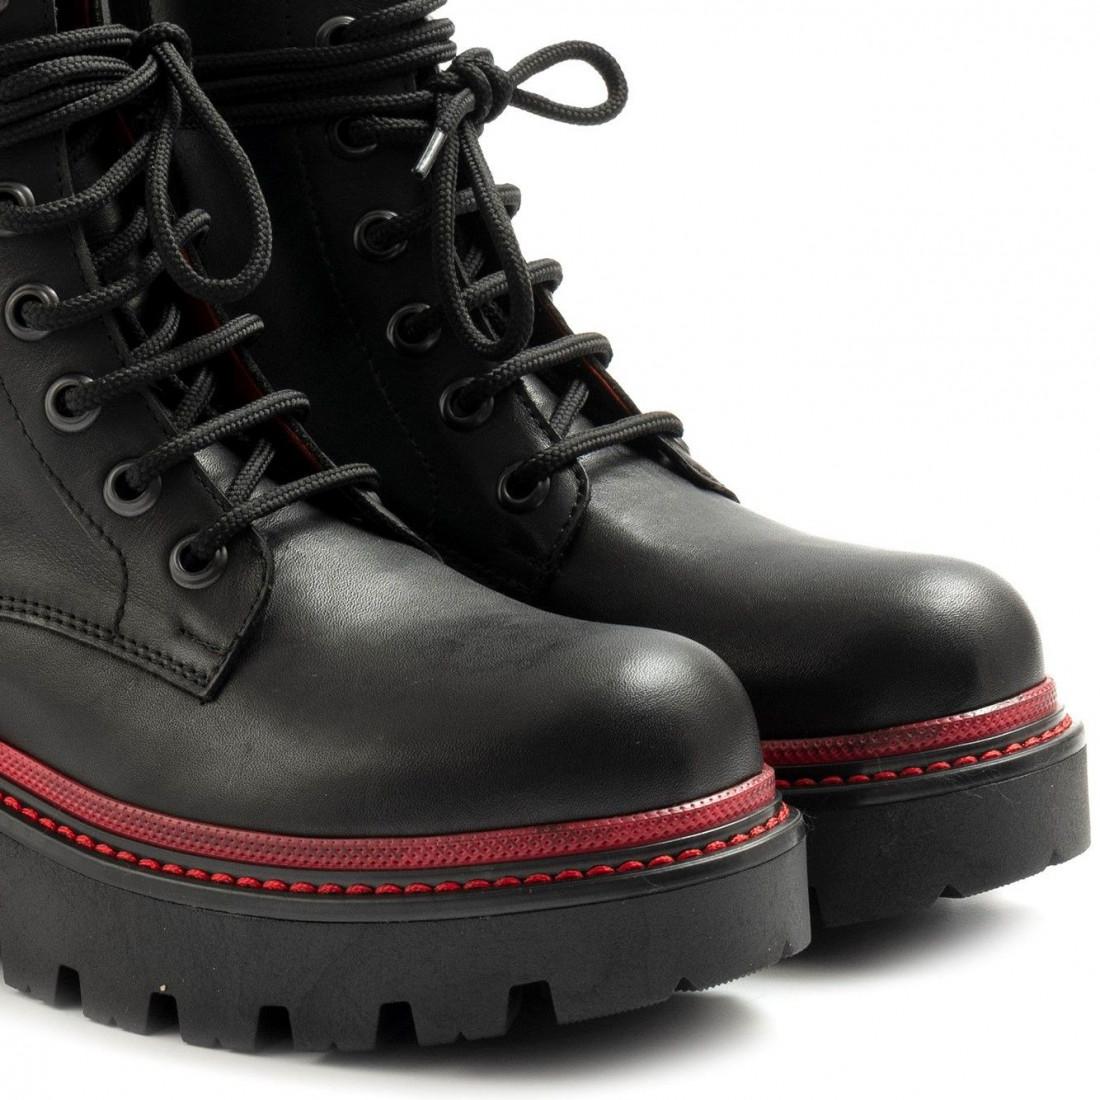 military boots woman zoe boston02vit nero 7963